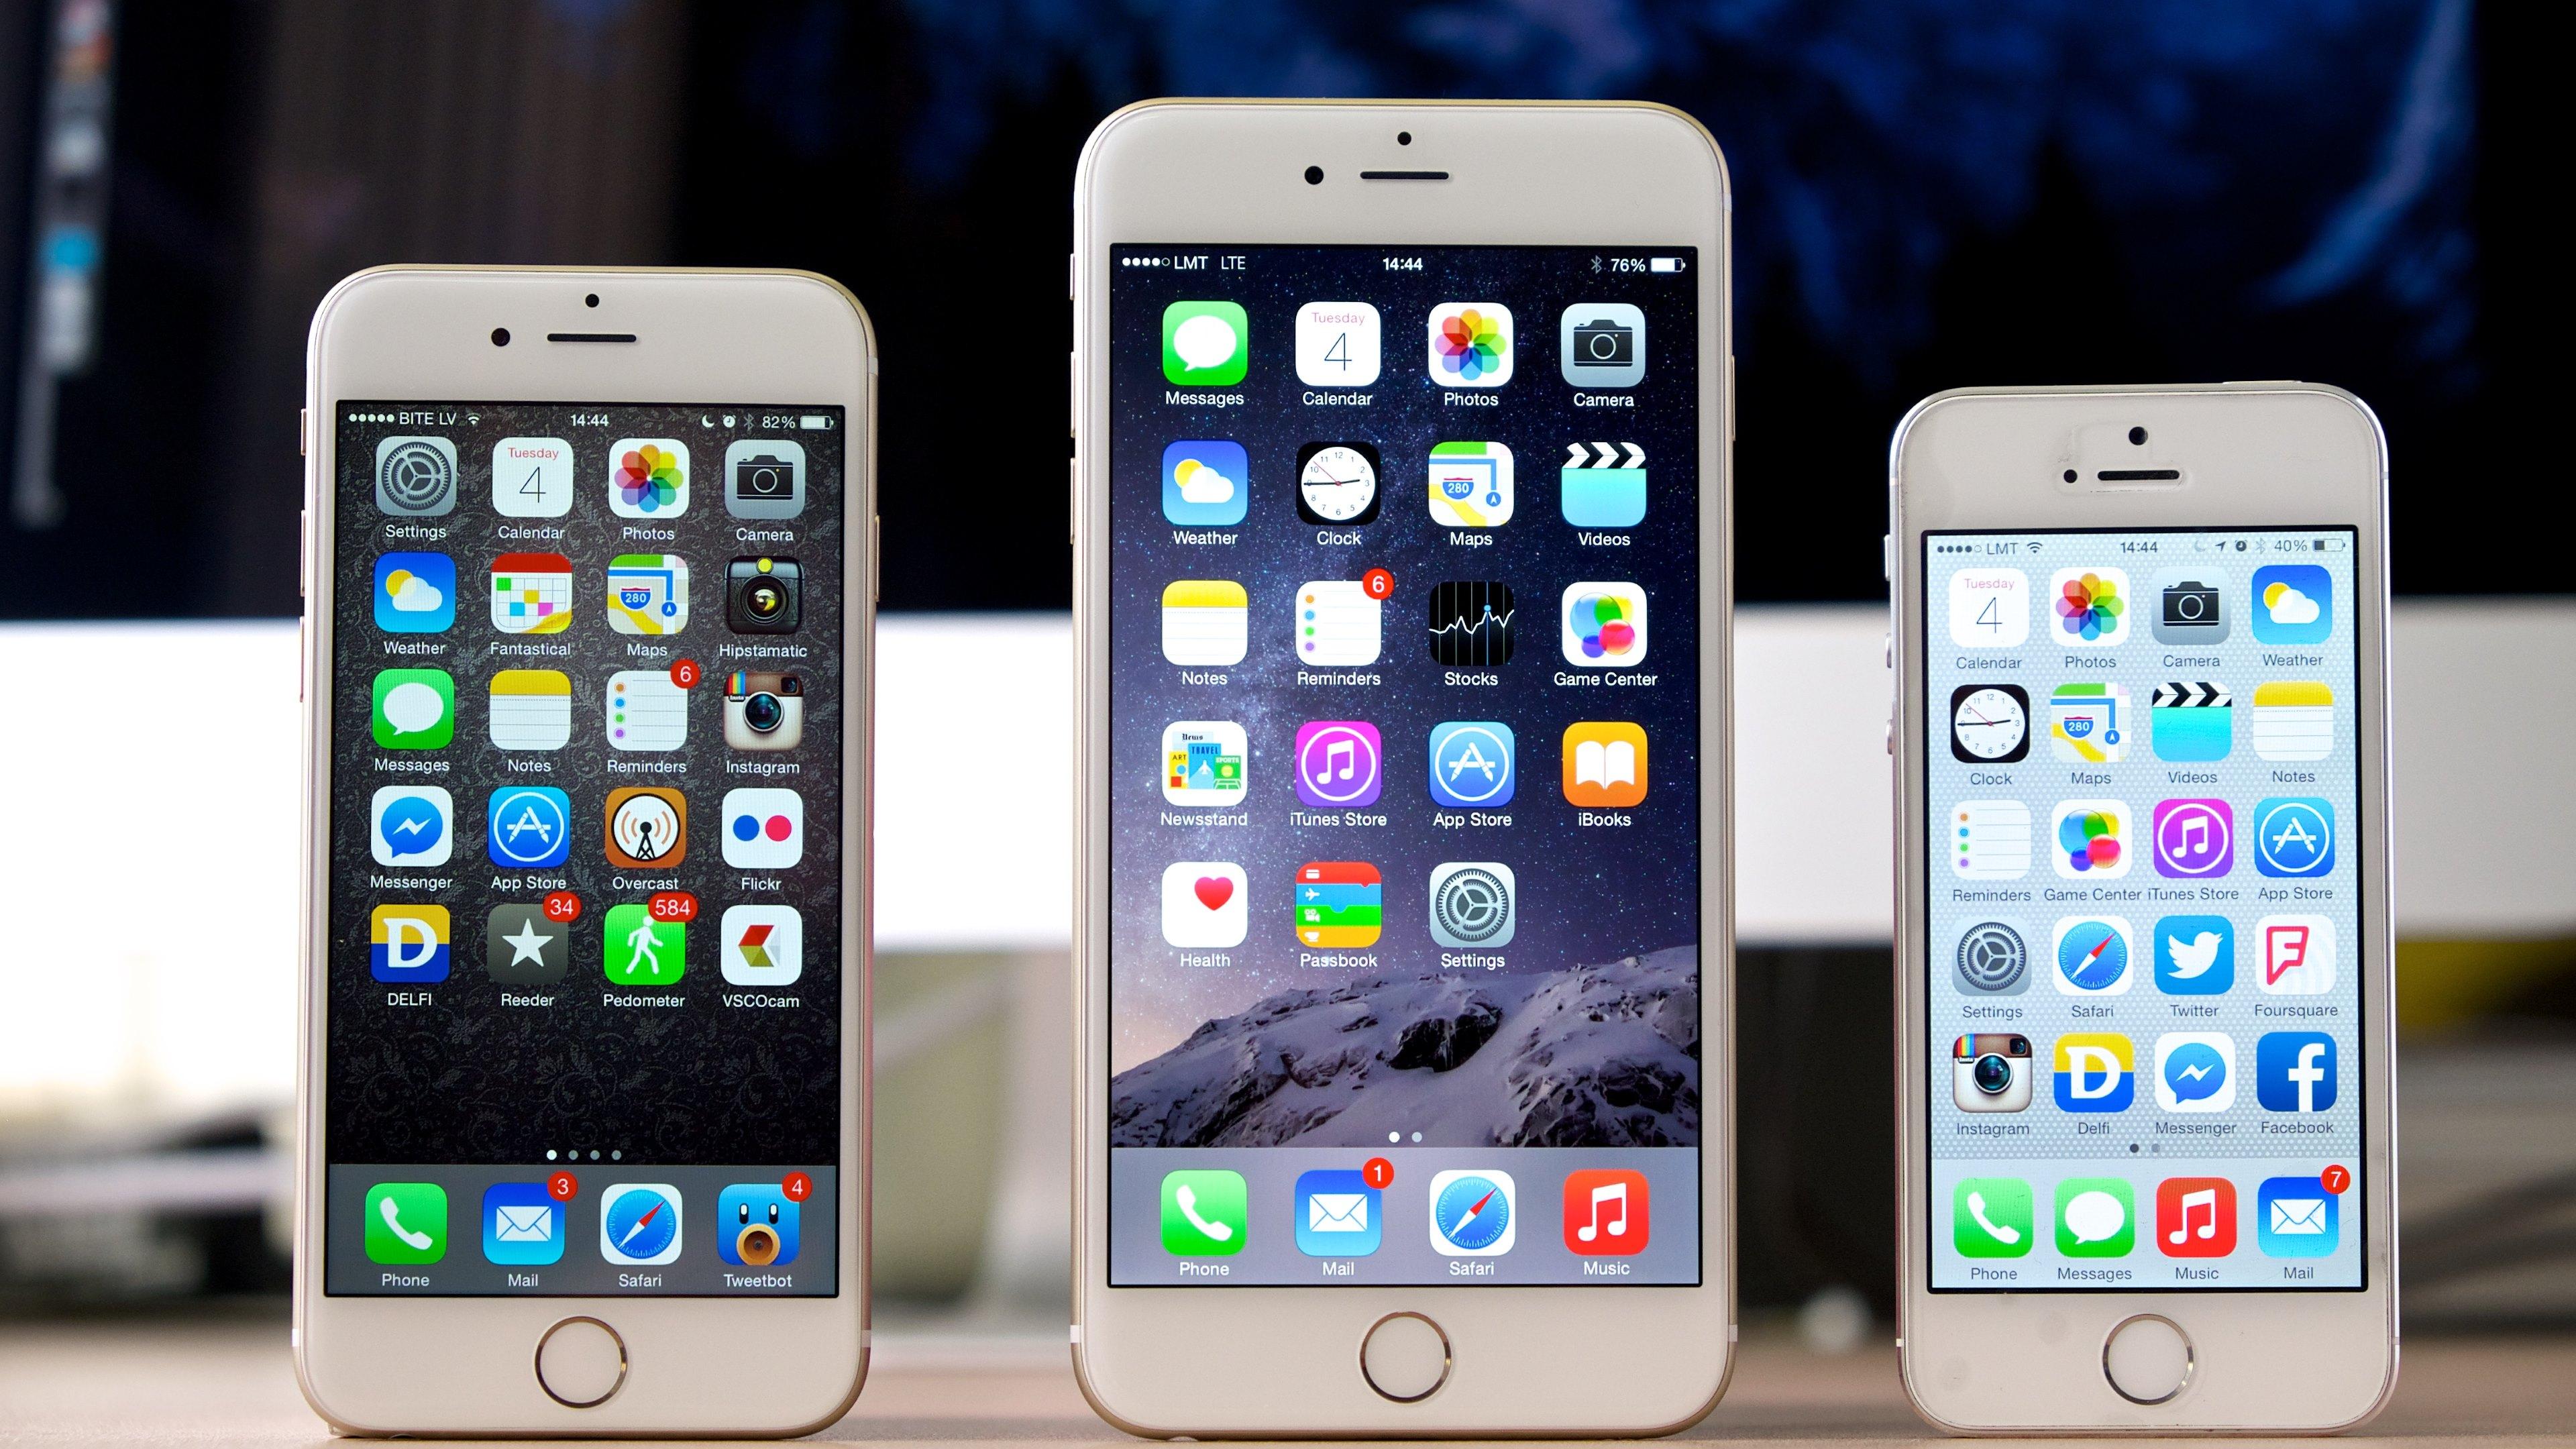 iPhone 6 vs iPhone 6 Plus vs iPhone 5S   Wallpaper 3840x2160